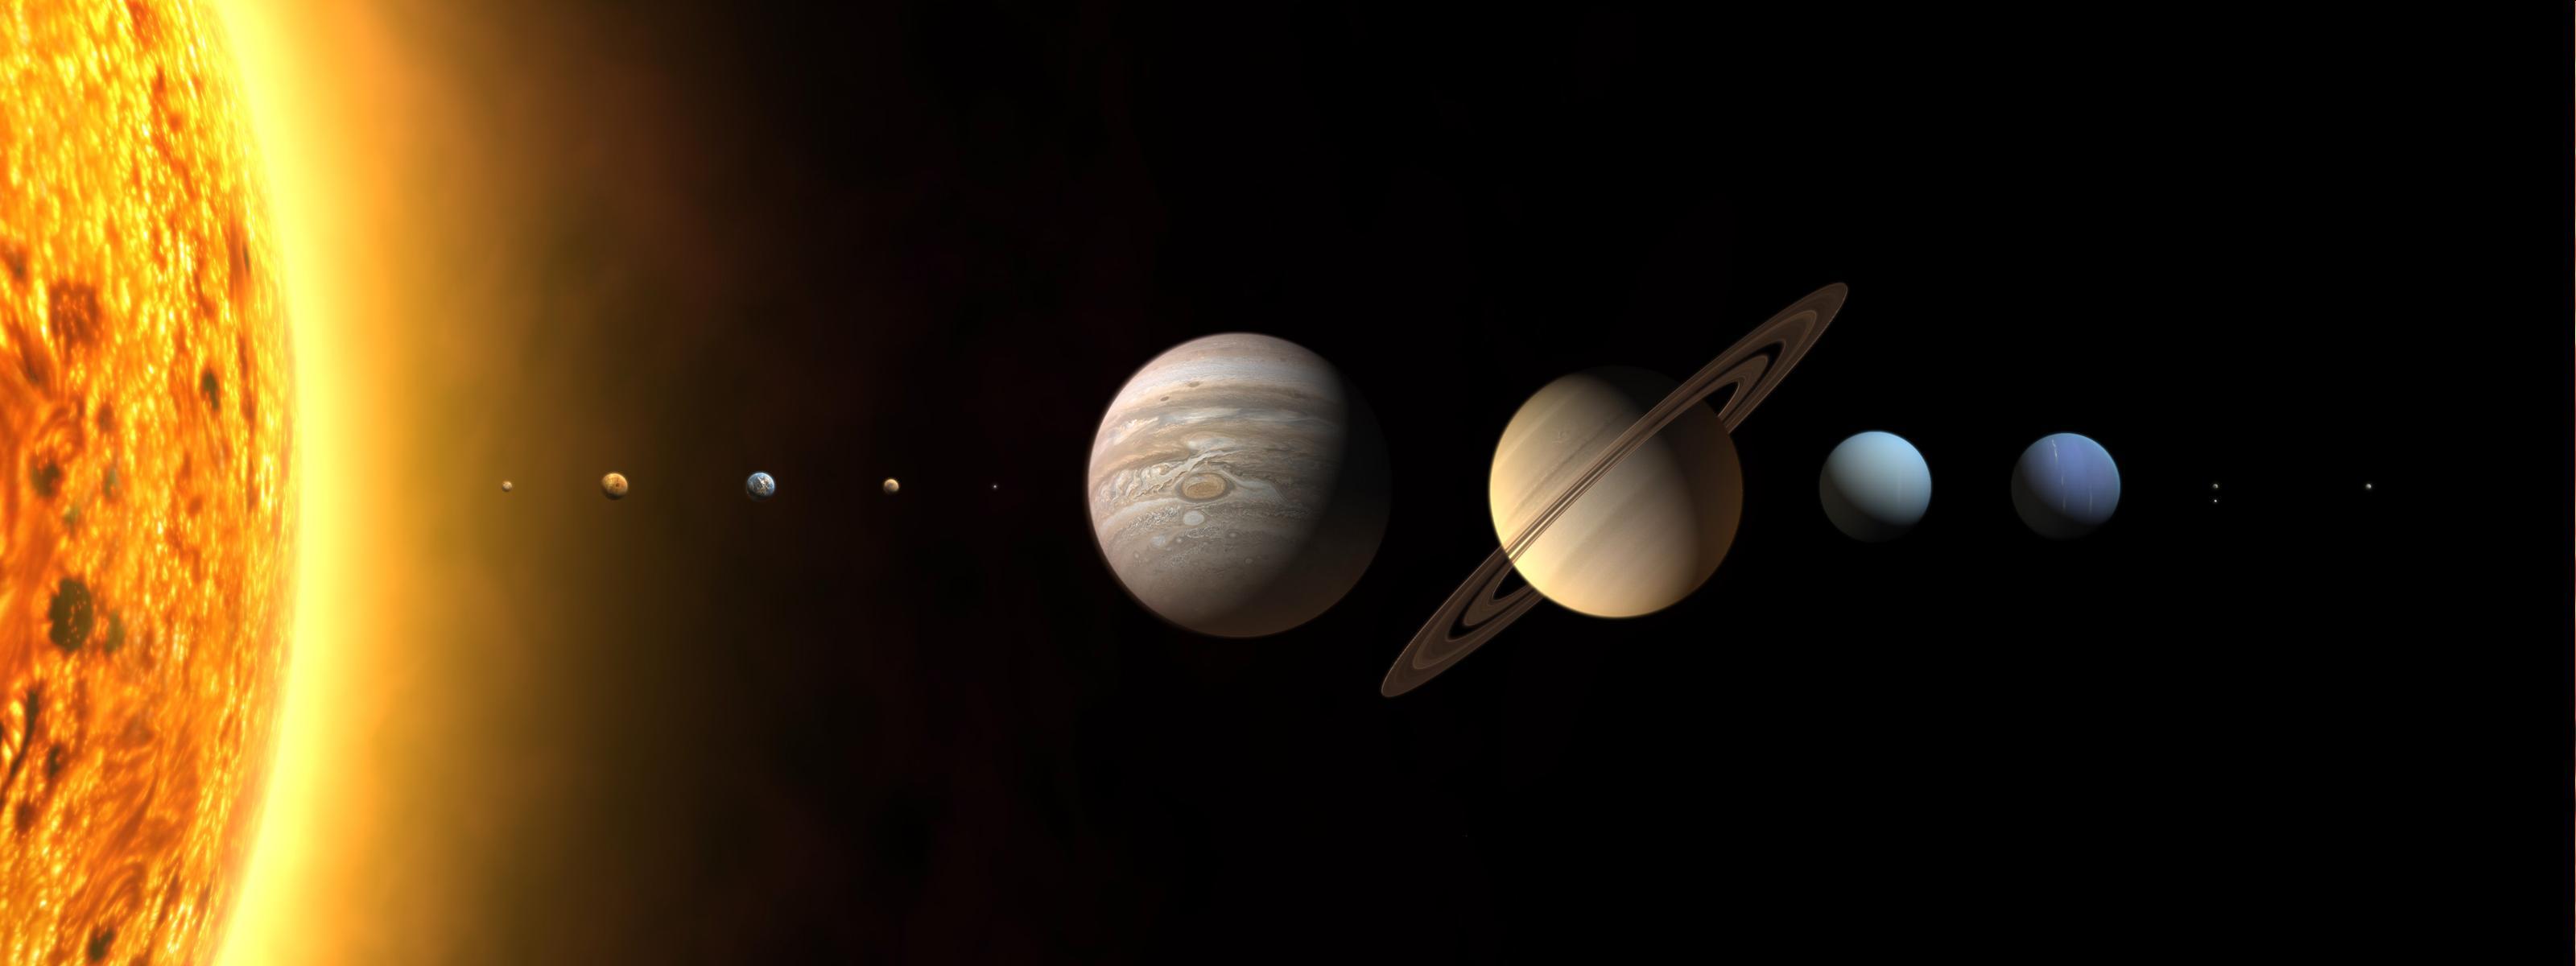 Dual Screen sci fi planets solar system sun moon science wallpaper 3200x1200